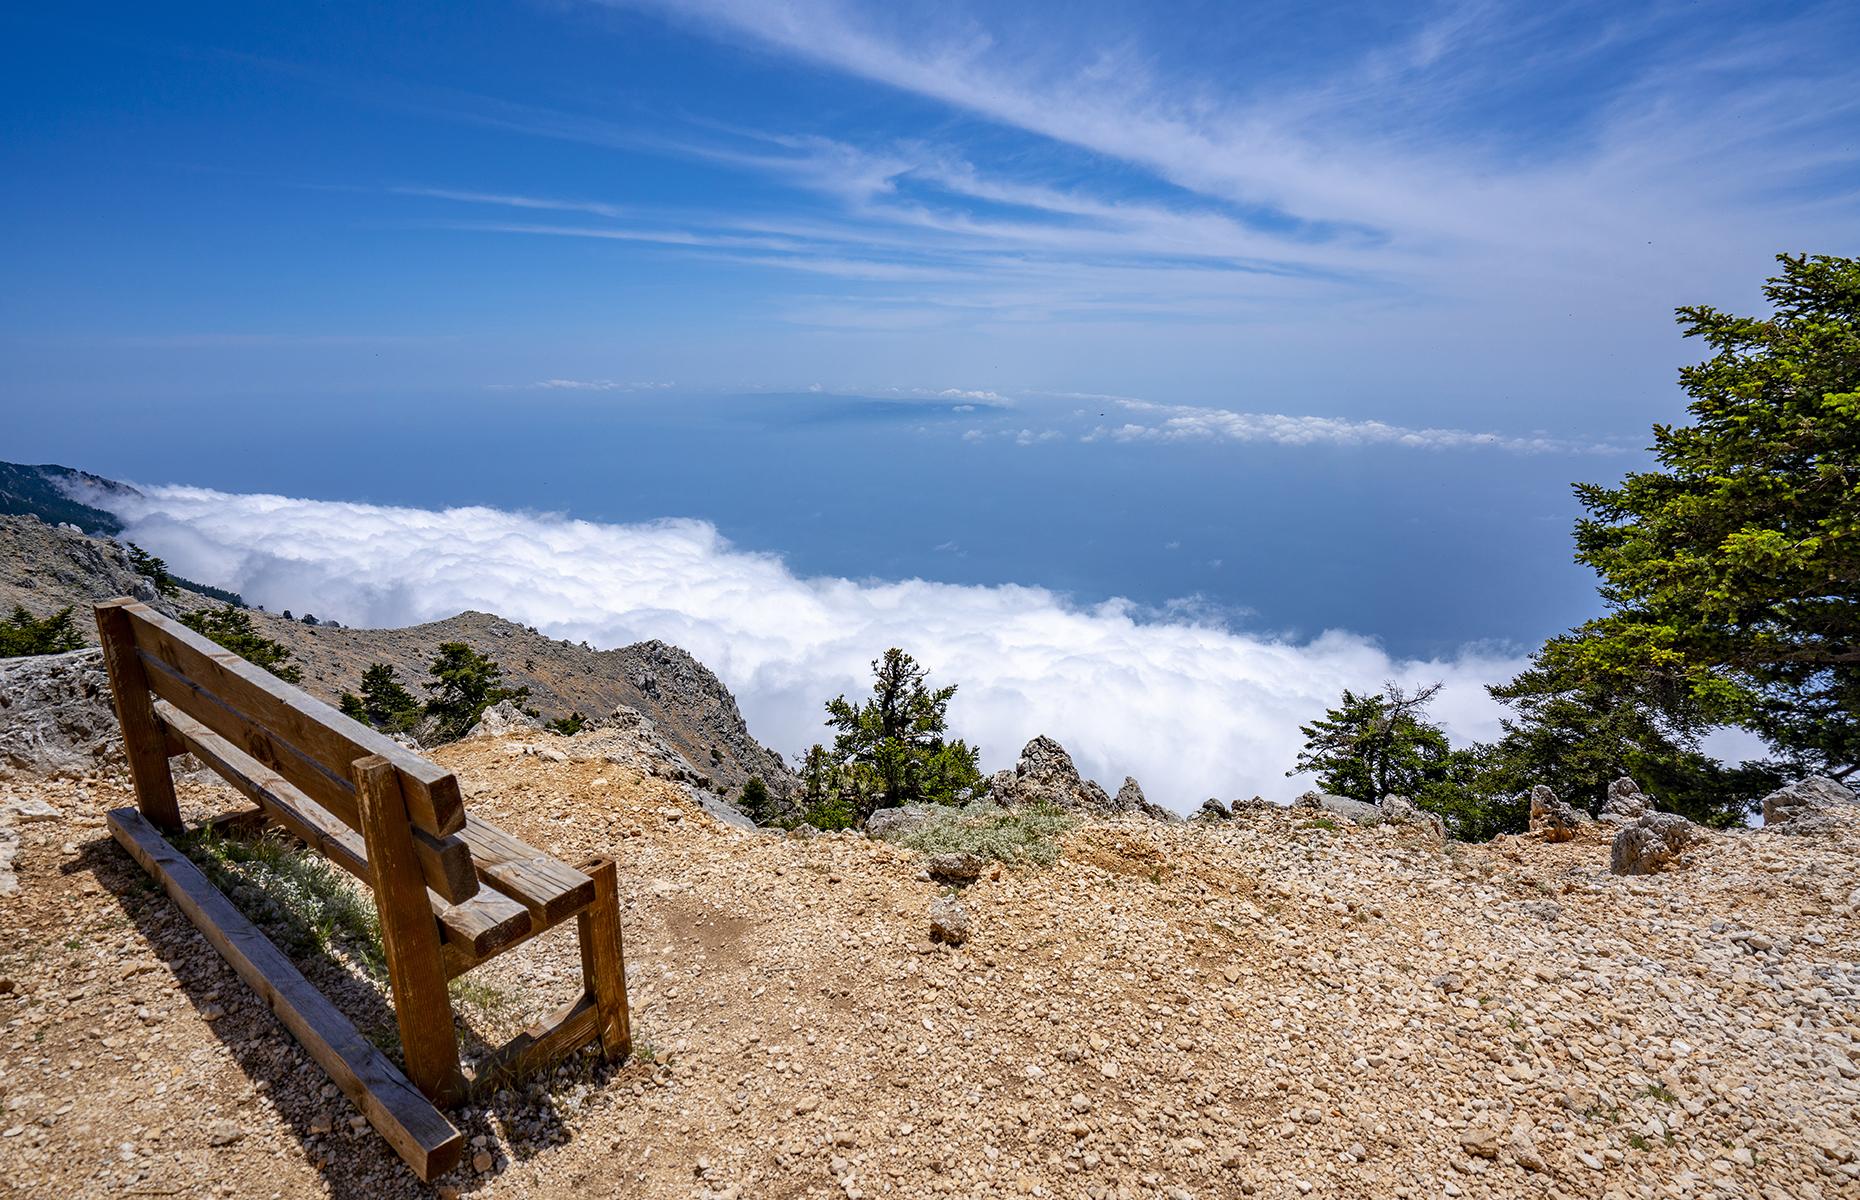 Mount Ainos (Image: Peto Laszlo/Shutterstock)